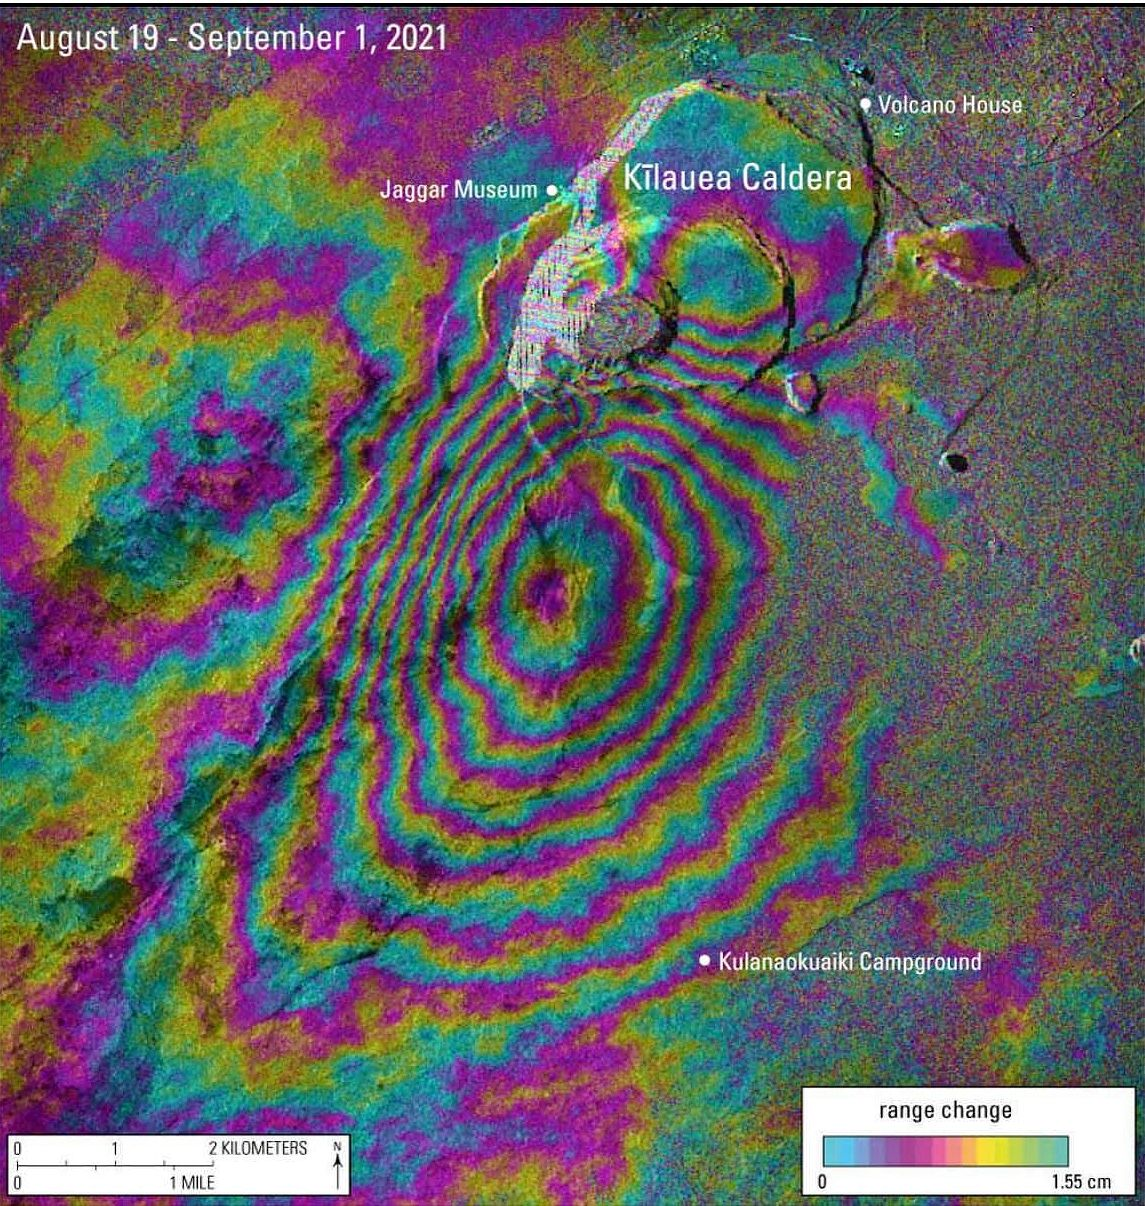 Kilauea - image interférogramme InSAR 19.08.2021 / 01.09.2021, illustrant l'intrusion magmatique au sud de l'Halema'uma'u. - Doc. USGS  - Un clic pour agrandir